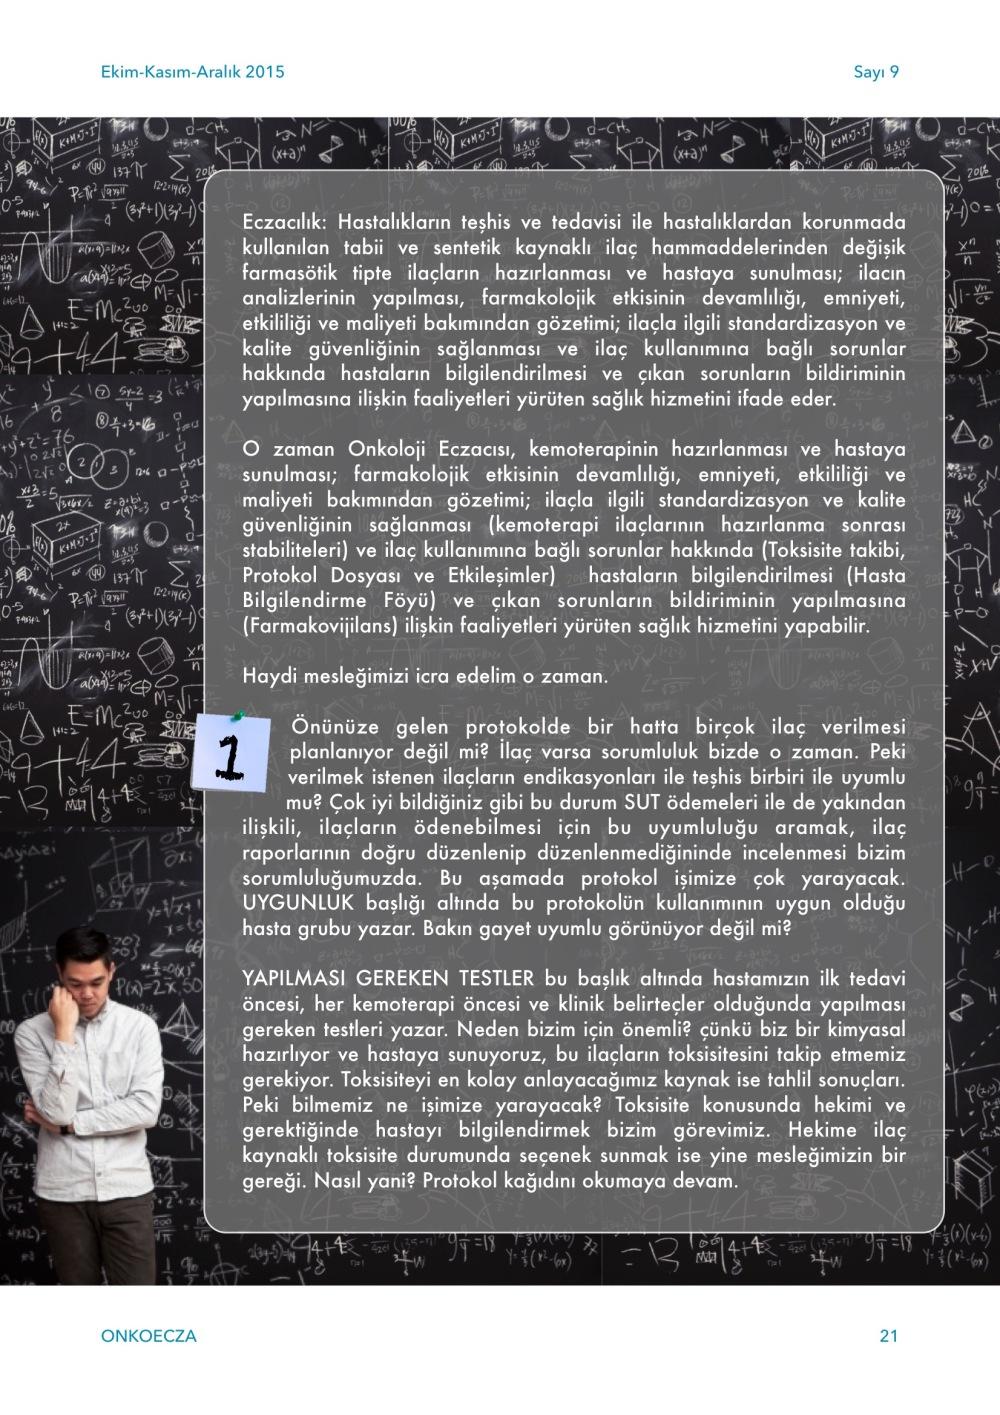 ONKOECZADERGIsayı9 21-21